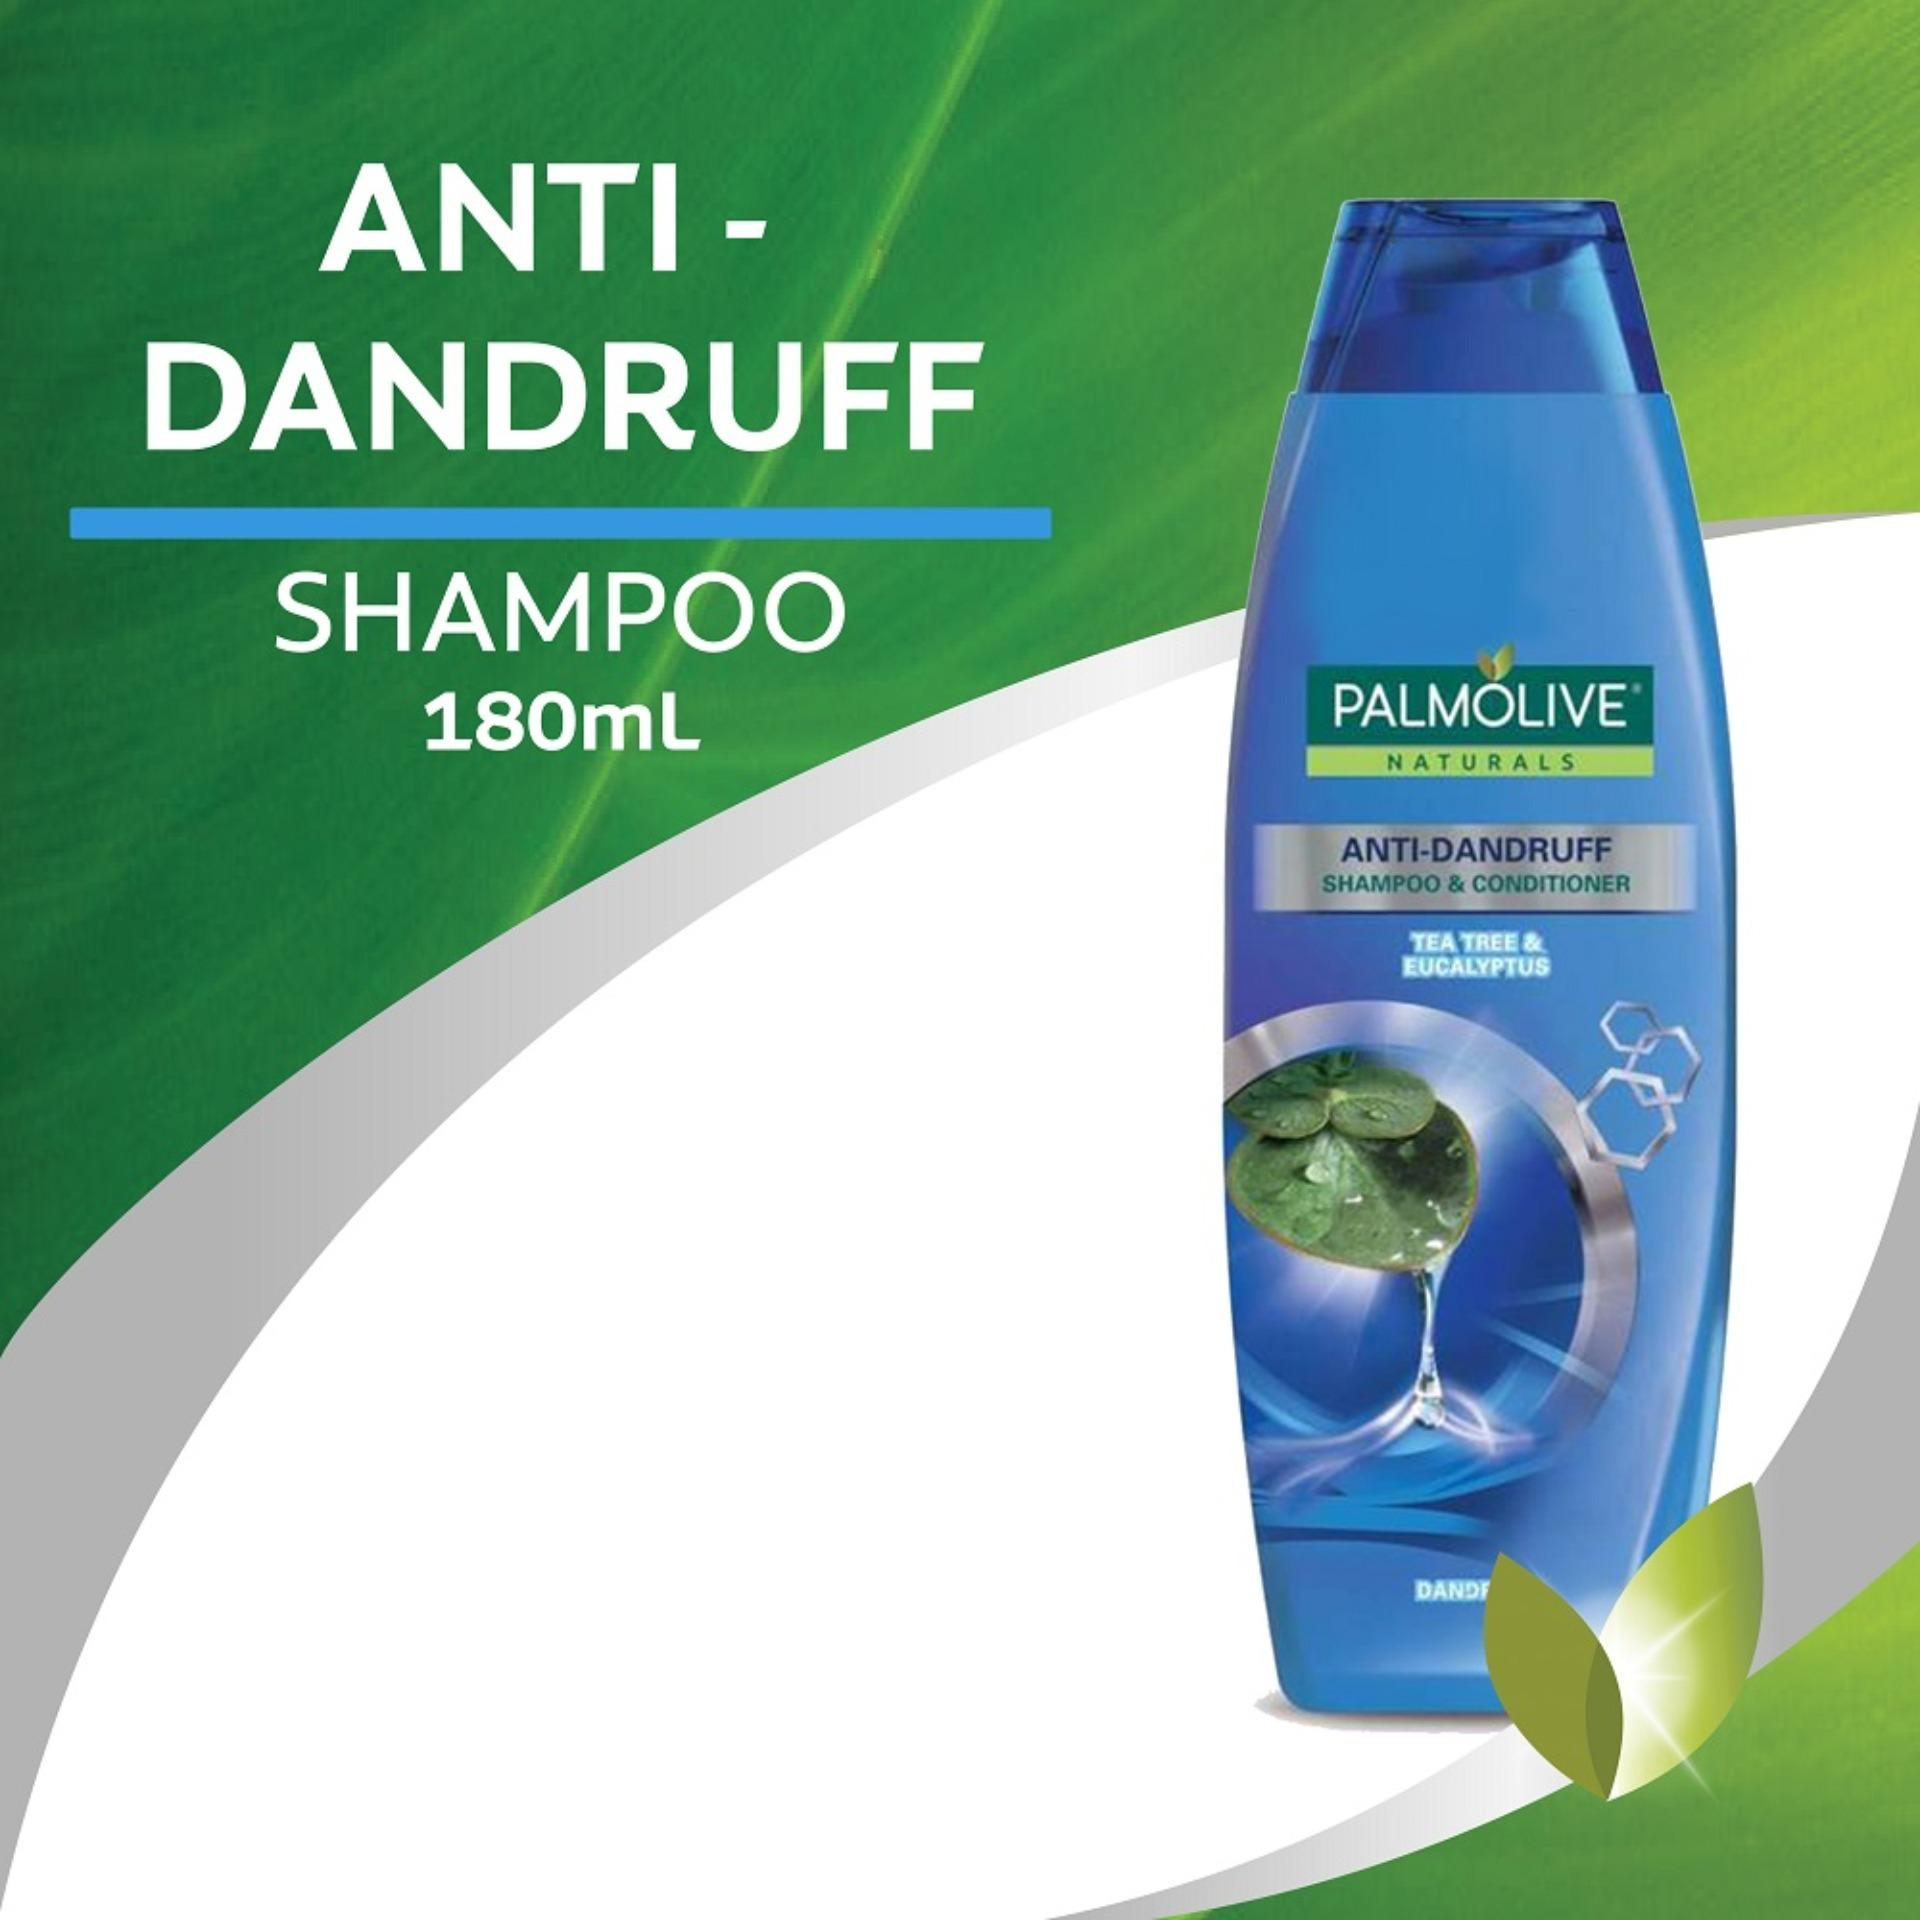 Palmolive Naturals Healthy Smooth Cream Conditioner Normal Hair Sunsilk Shampoo Anti Dandruff 170ml Twin Pack 180ml